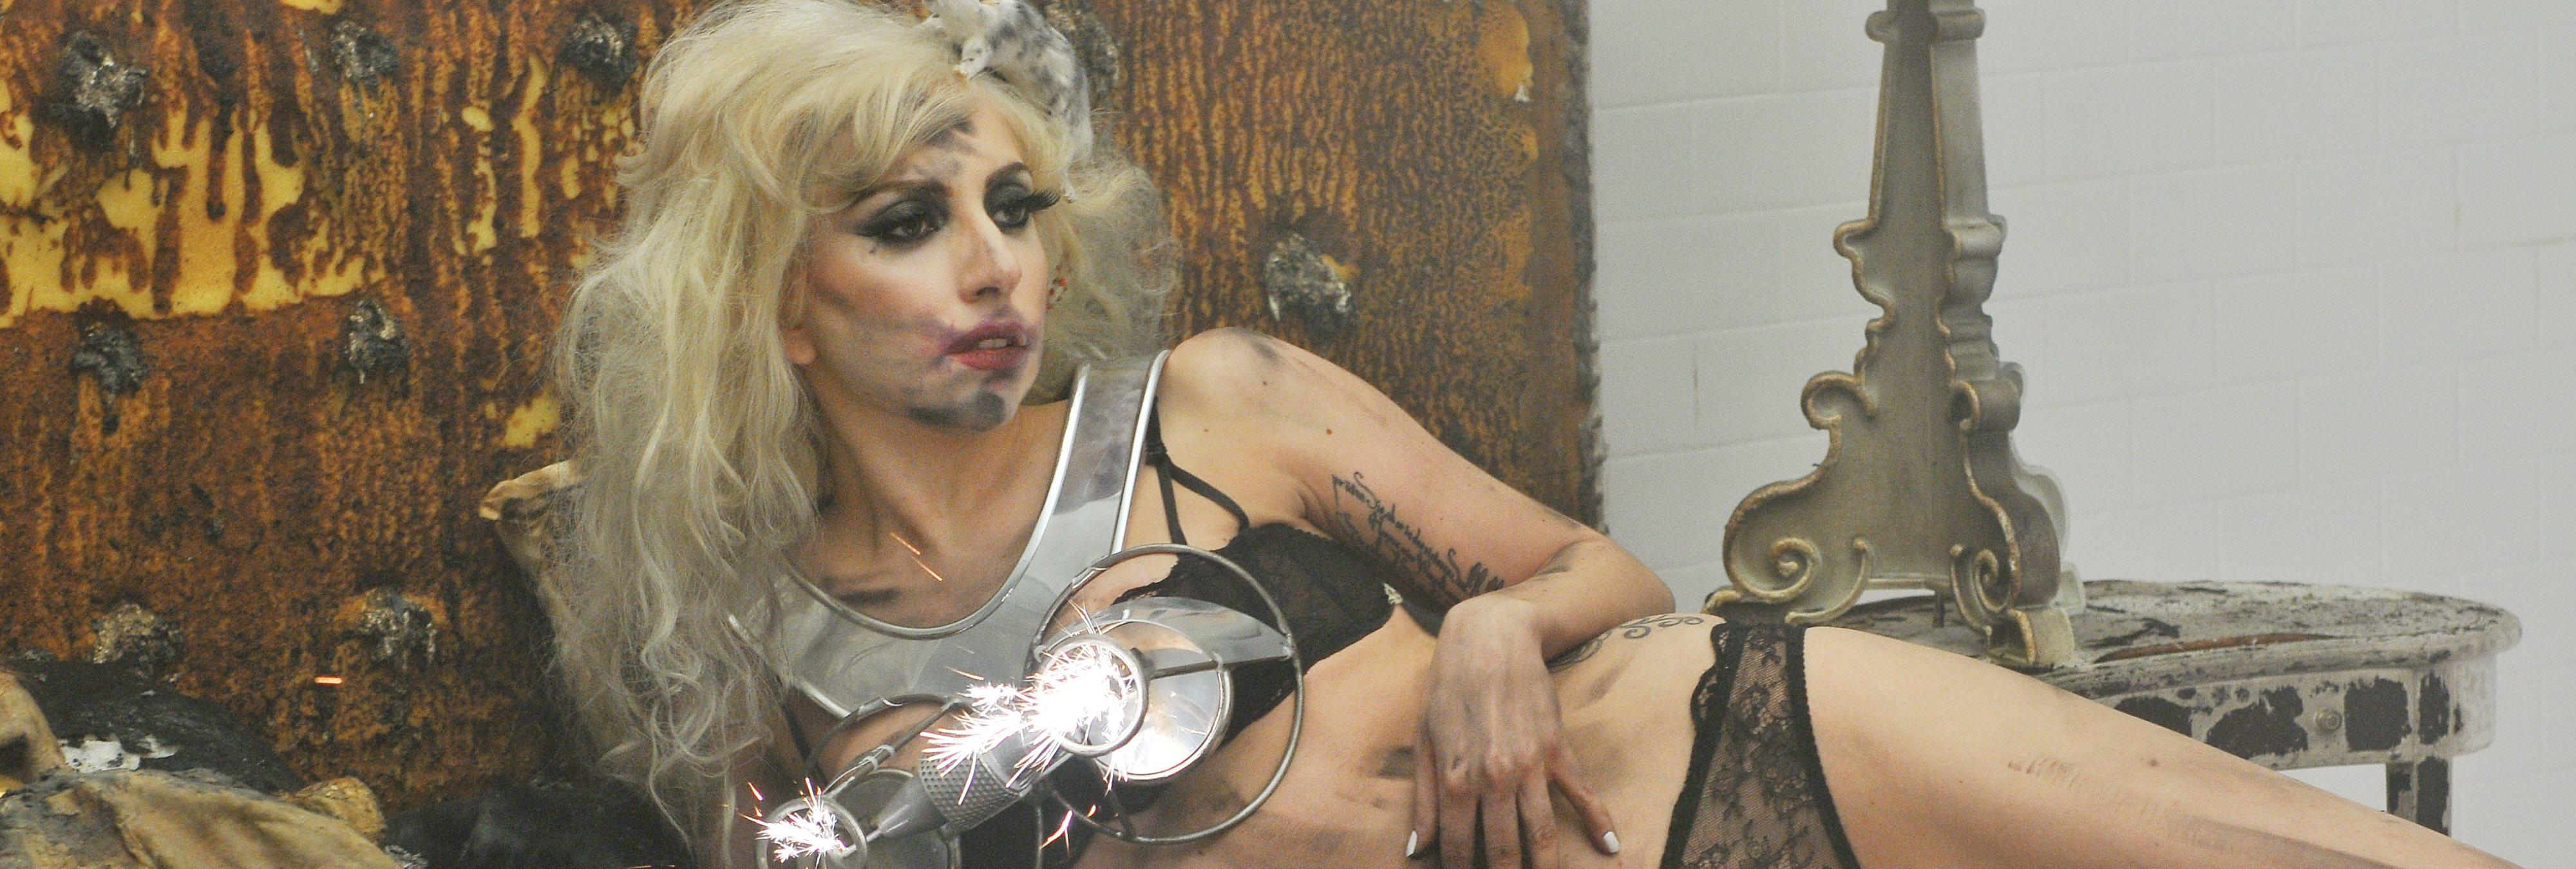 'Bad Romance', de Lady Gaga, elegido mejor videoclip del siglo XXI